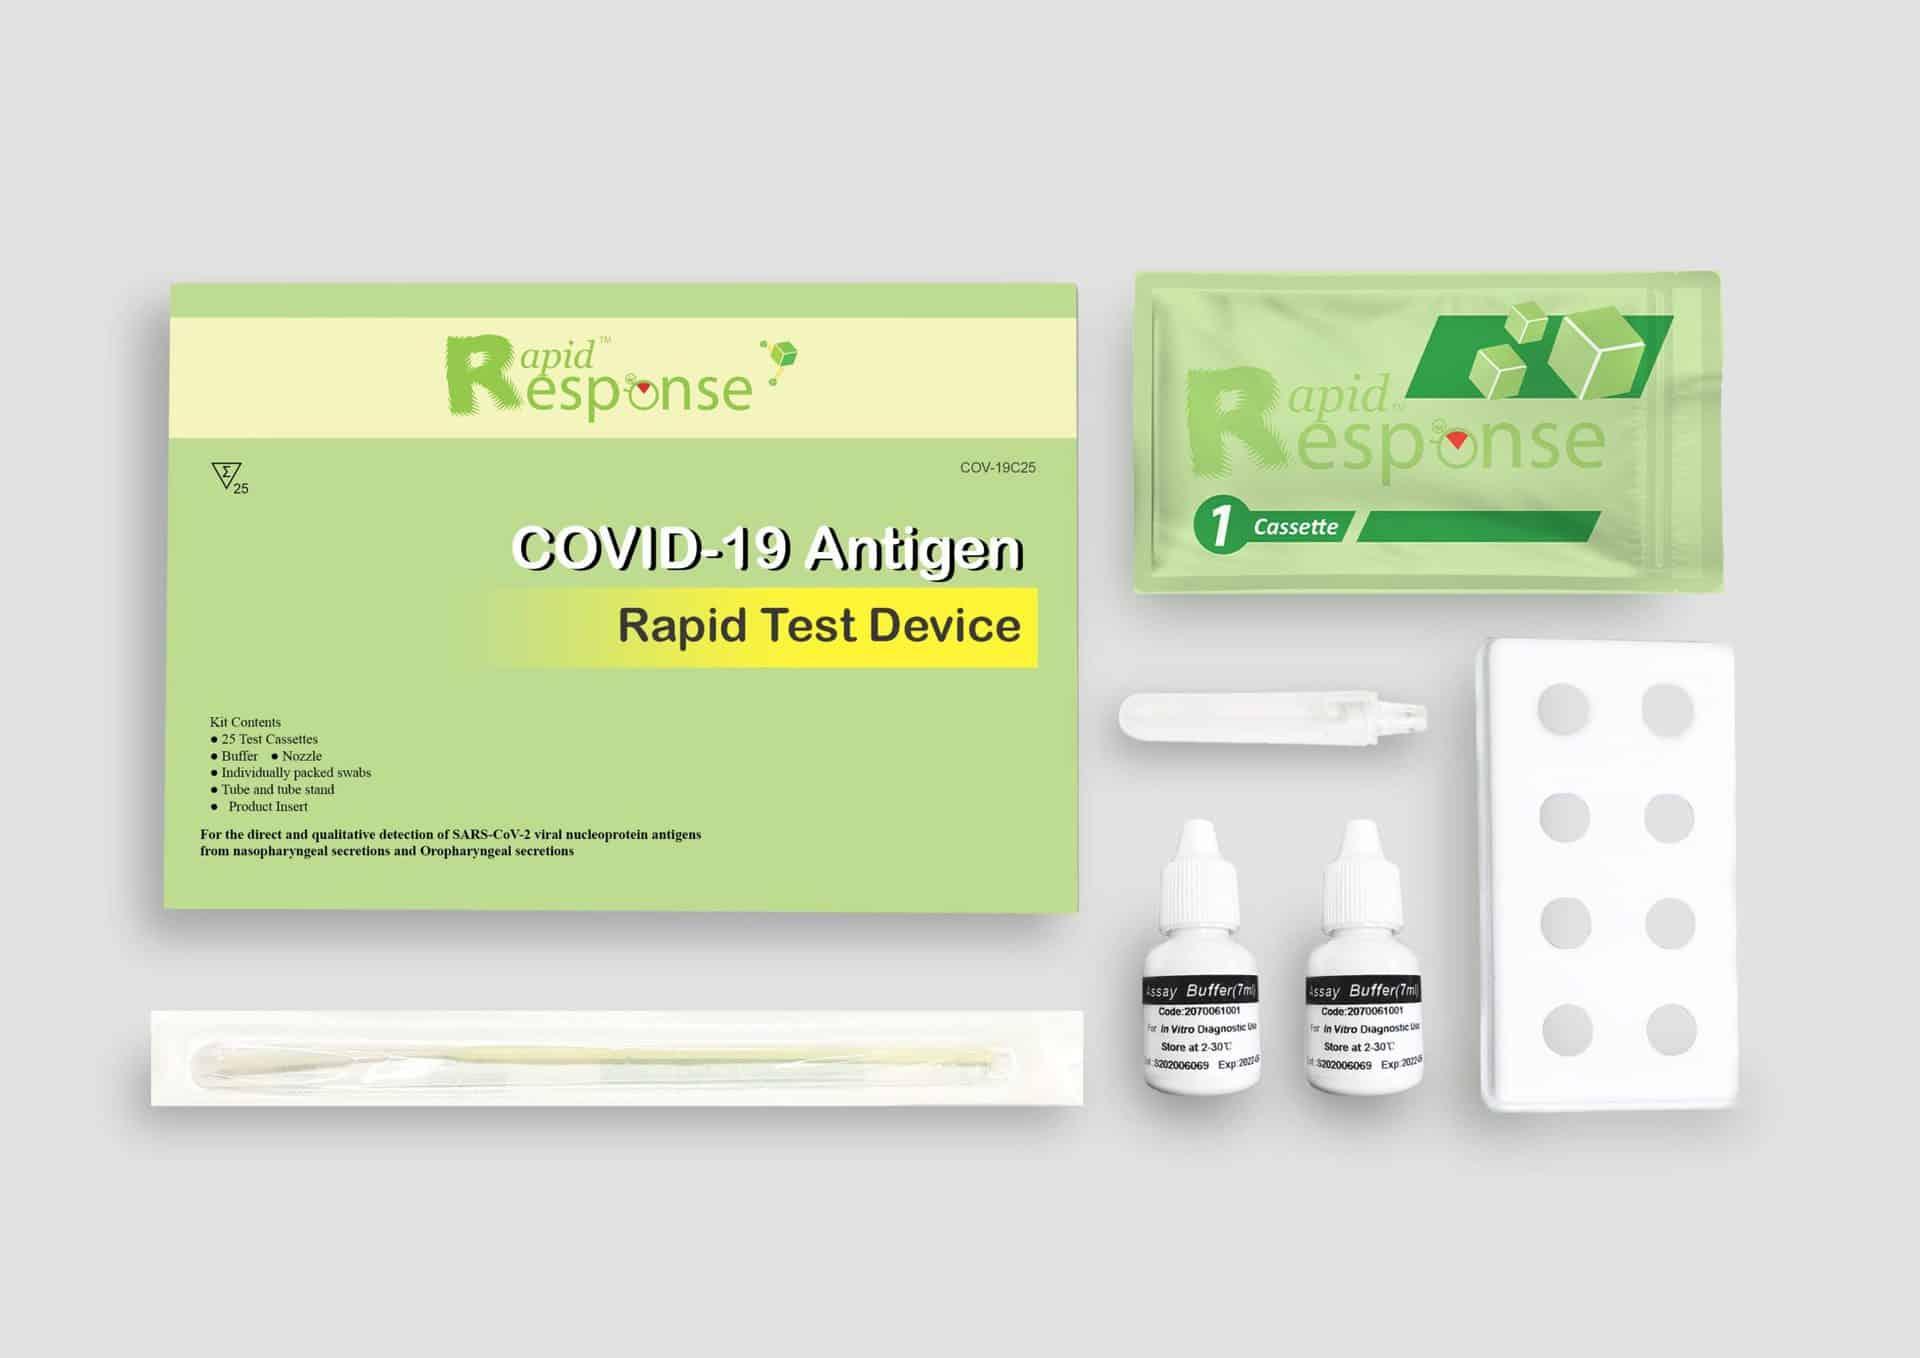 nitrile gloves medical white background hospital covid medical healthcare doctor